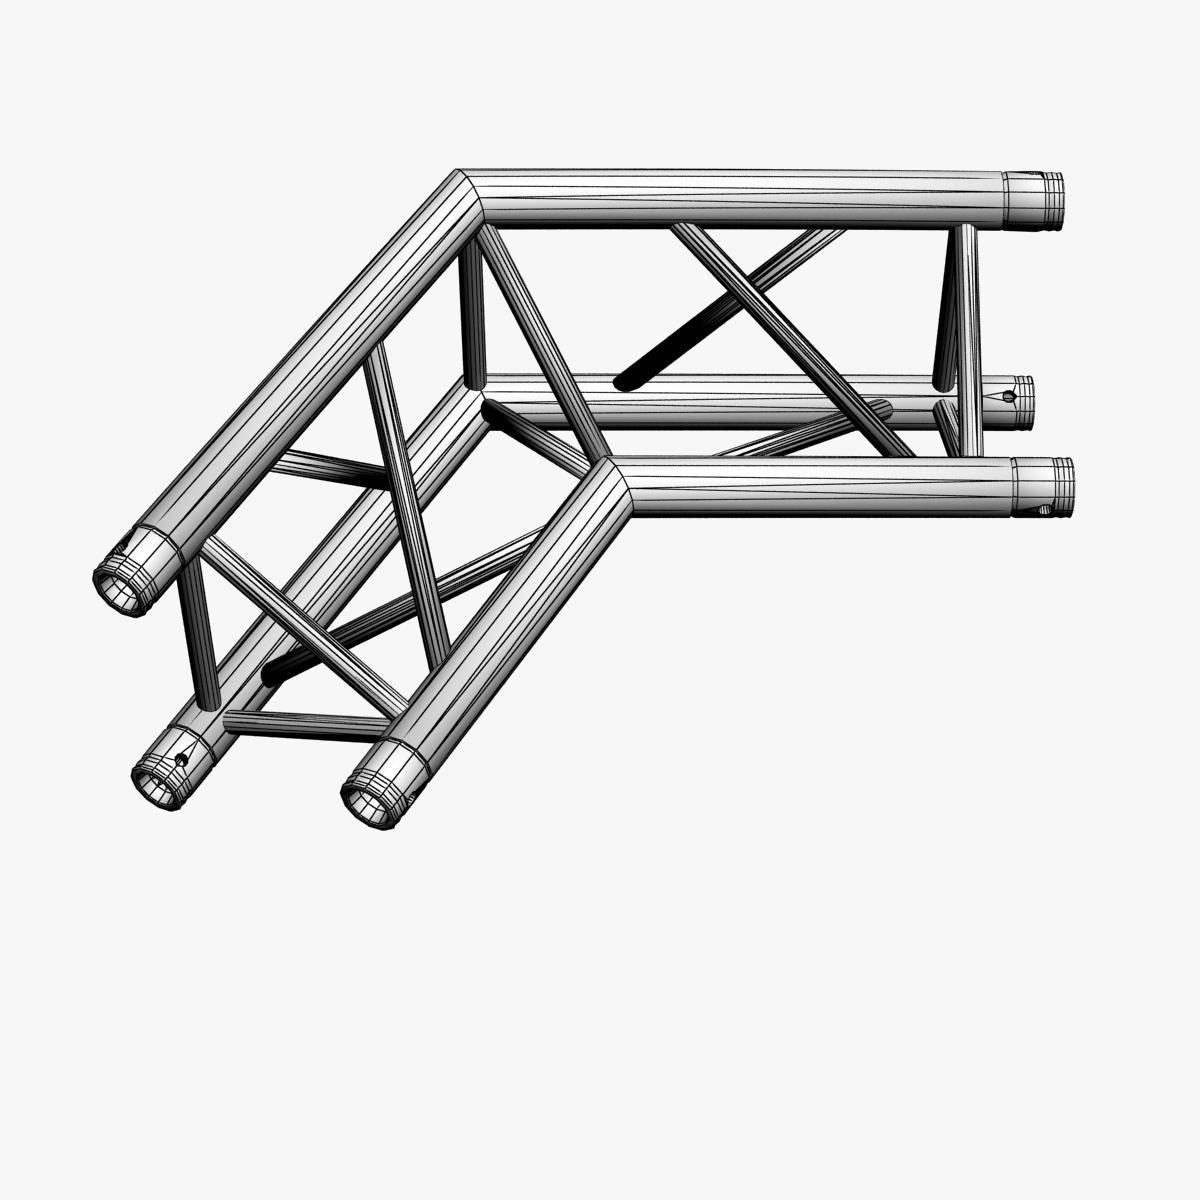 triangular trusses (collection 55 modular pieces) 3d model 3ds max dxf fbx c4d dae texture obj 216248